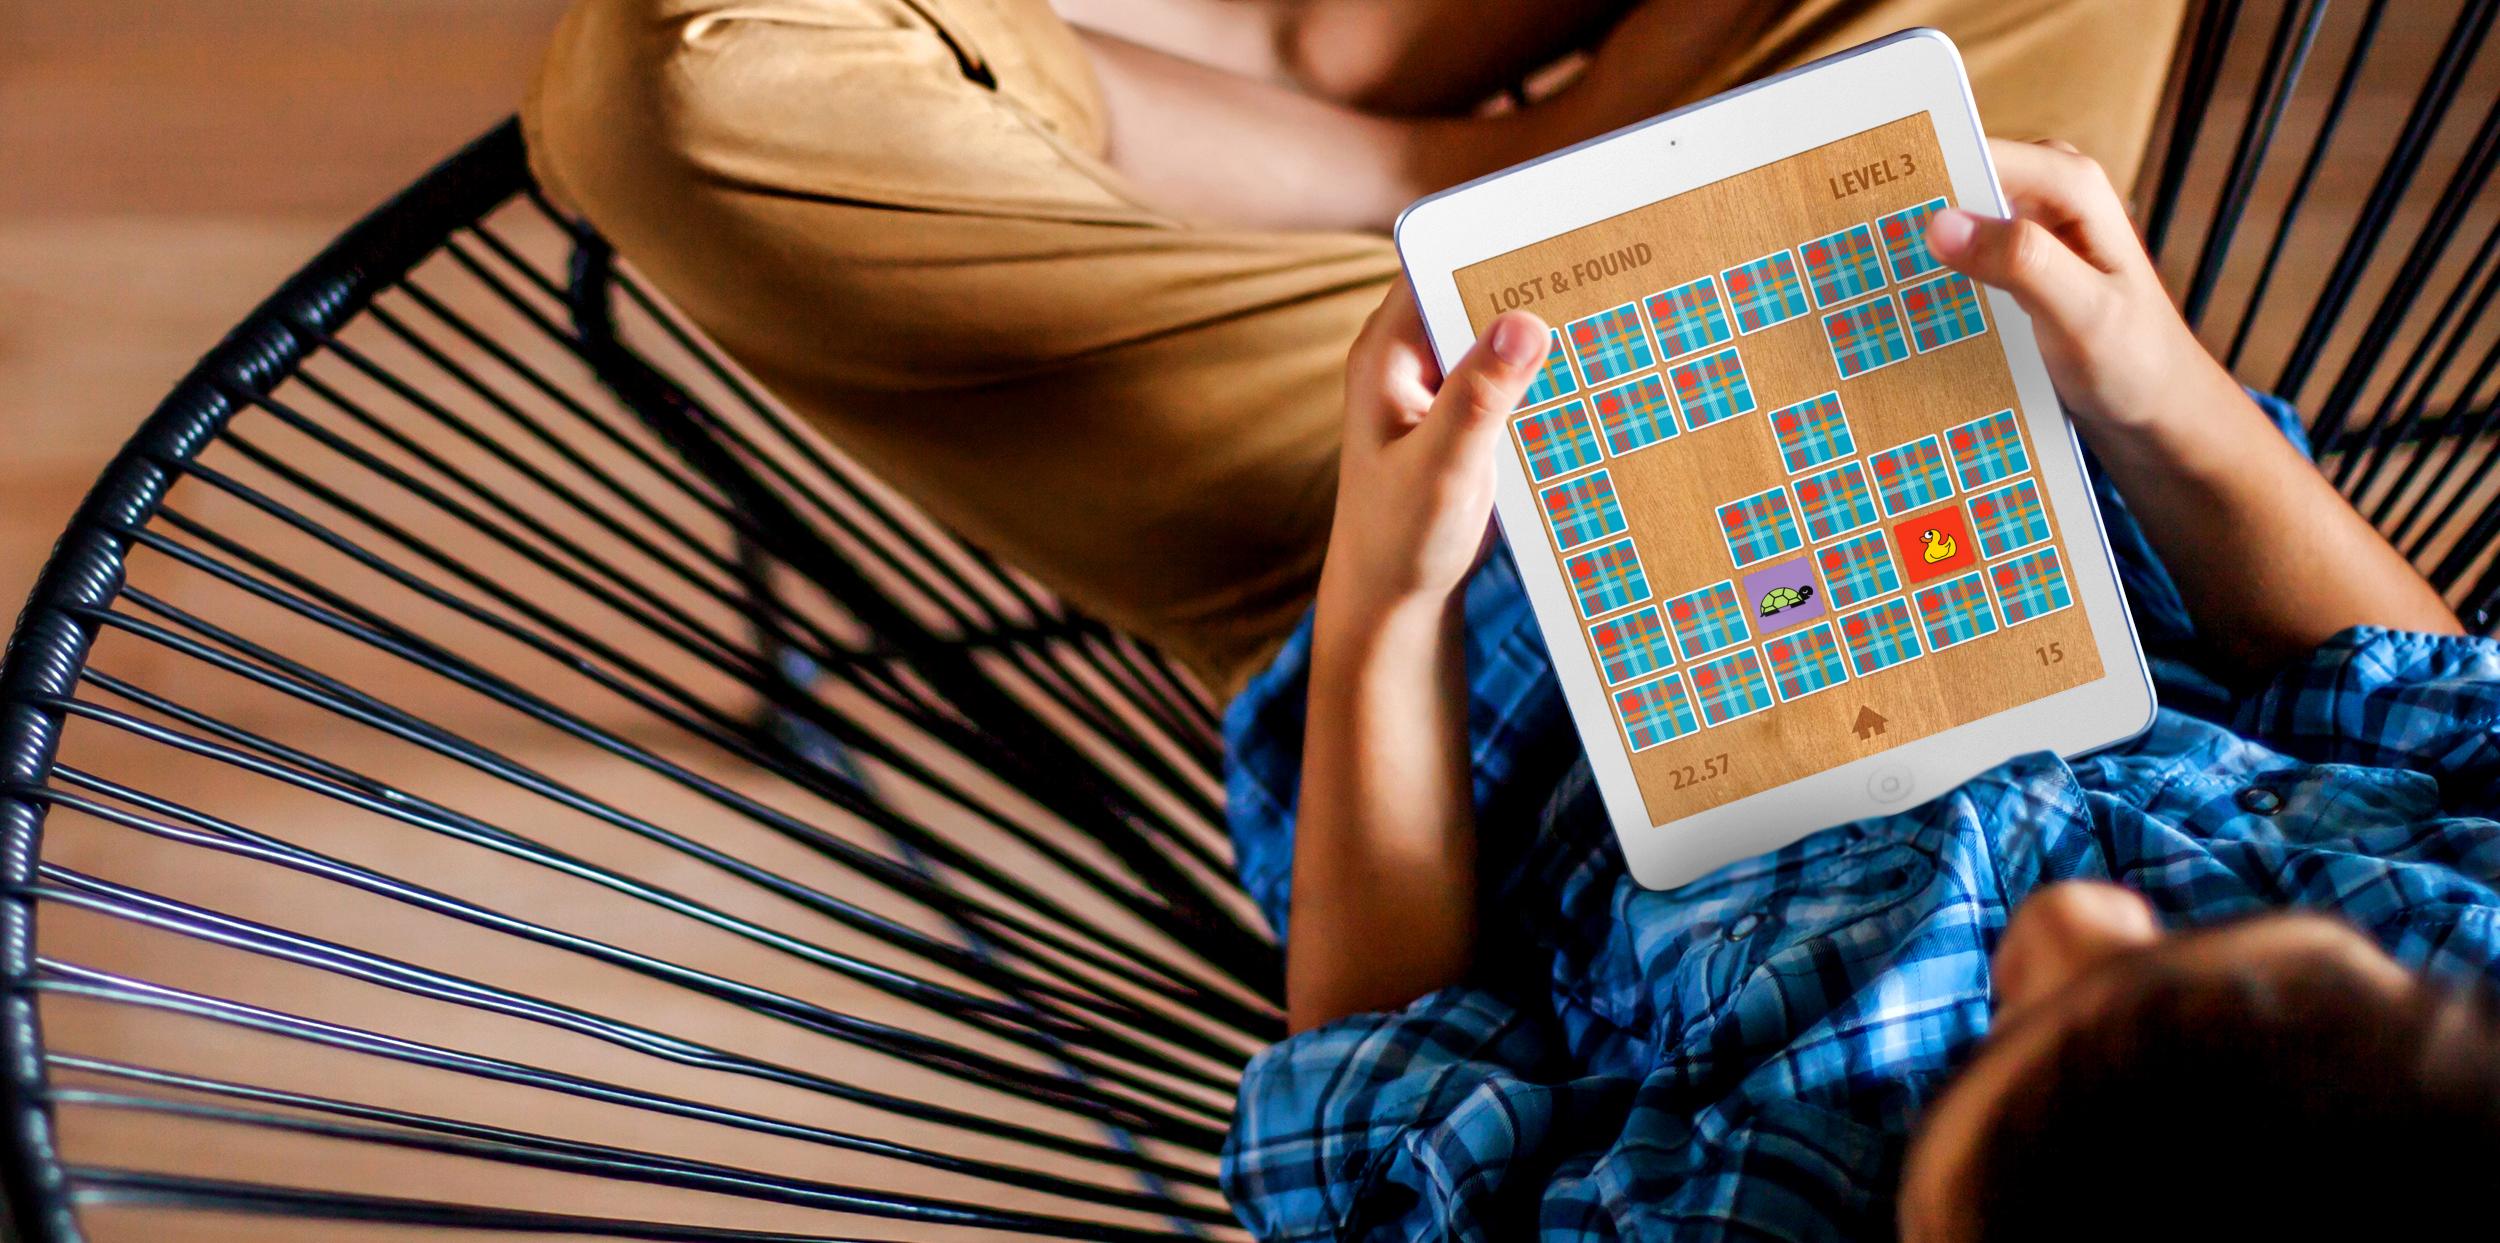 Memory_Game-Free_Games-GOOD_PUPPY_TOTAL_RECALL-.jpg